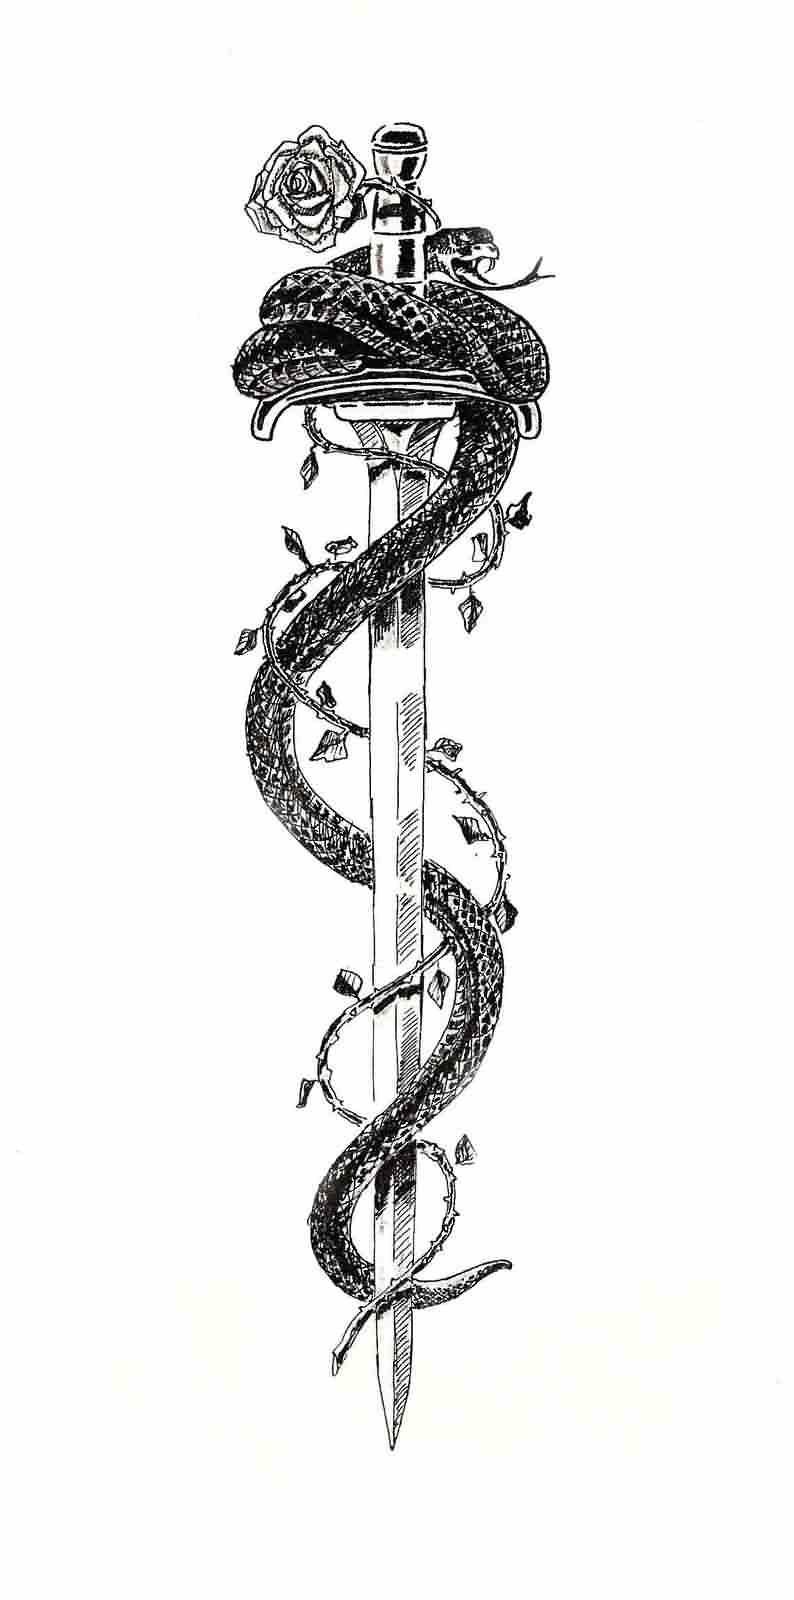 Dragon And Samurai Sword Tattoo Design Tattoos Snake Tattoo